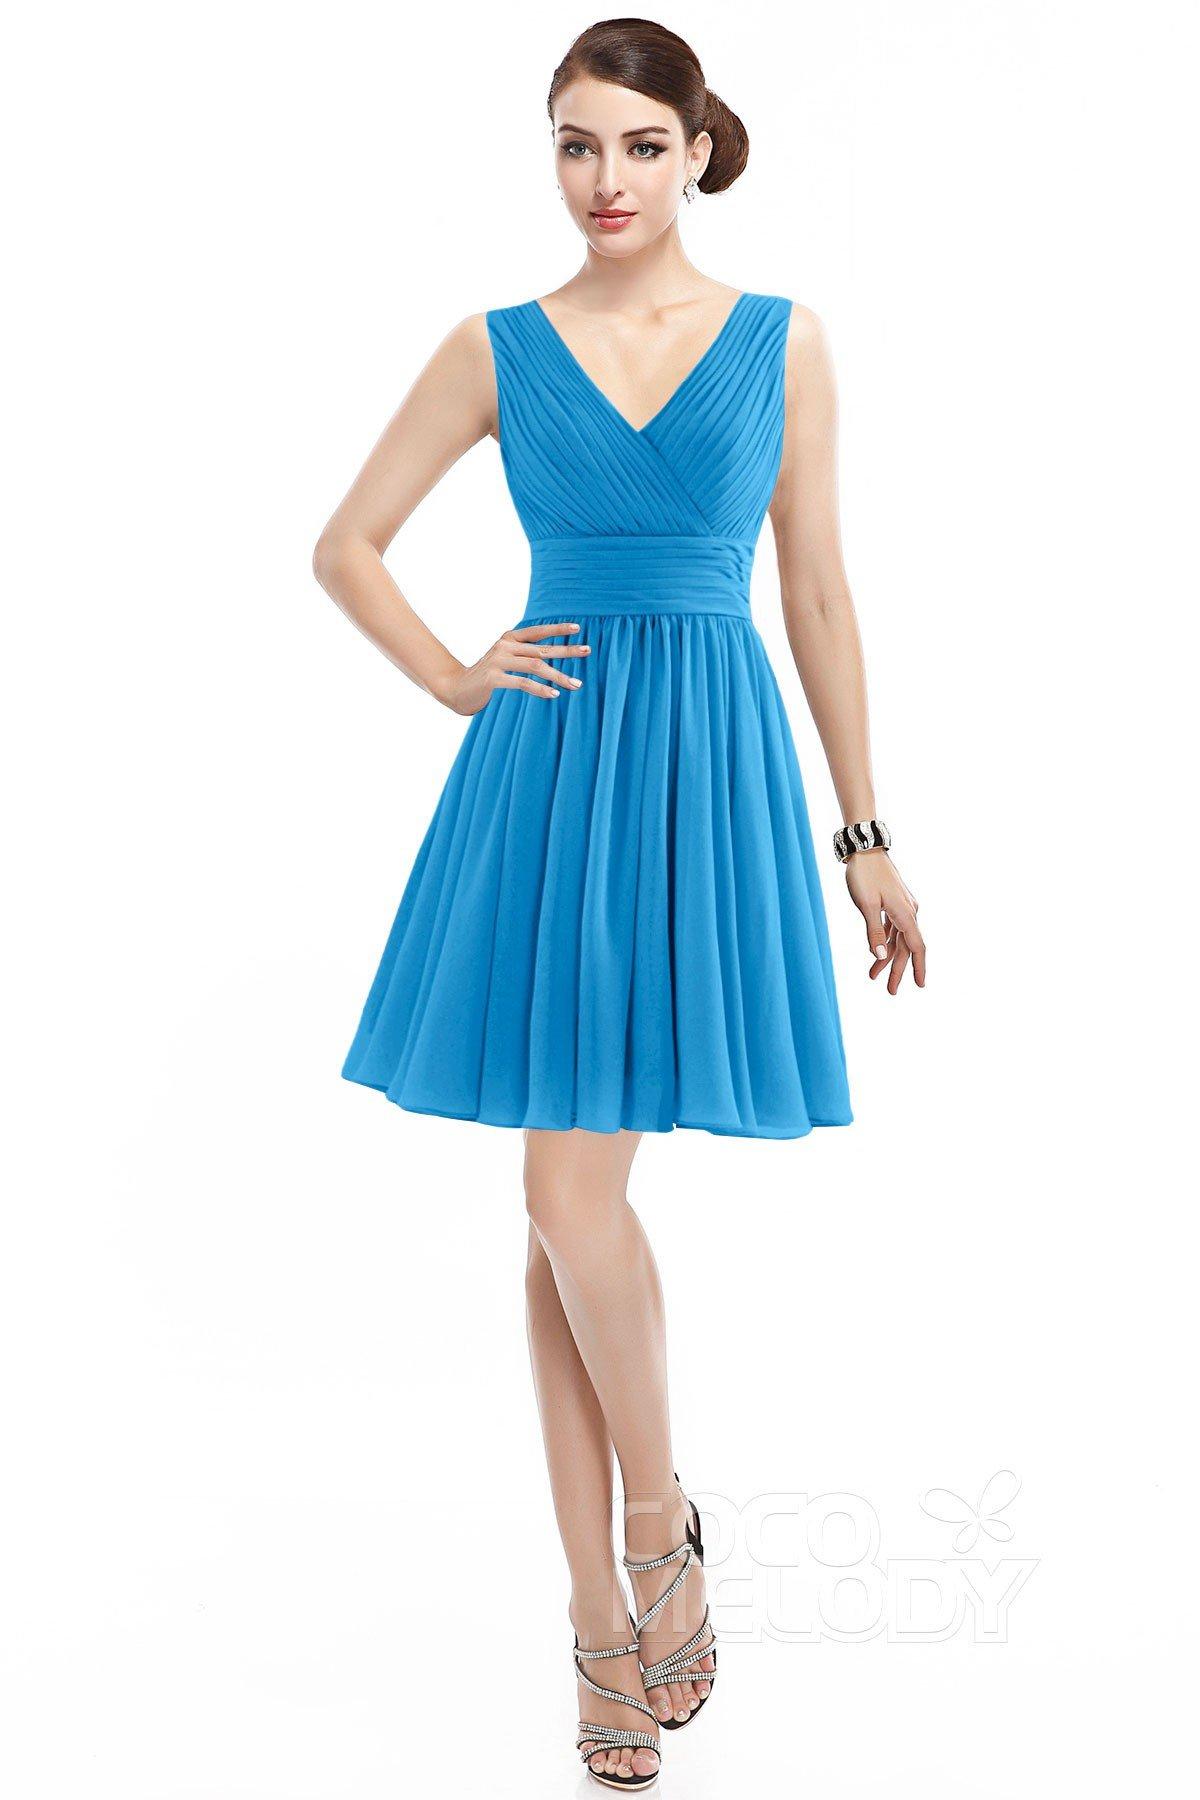 Casual A-Line V-Neck Natural Short Mini Chiffon Autumn Sunset Sleeveless Zipper Bridesmaid Dress COZK14019